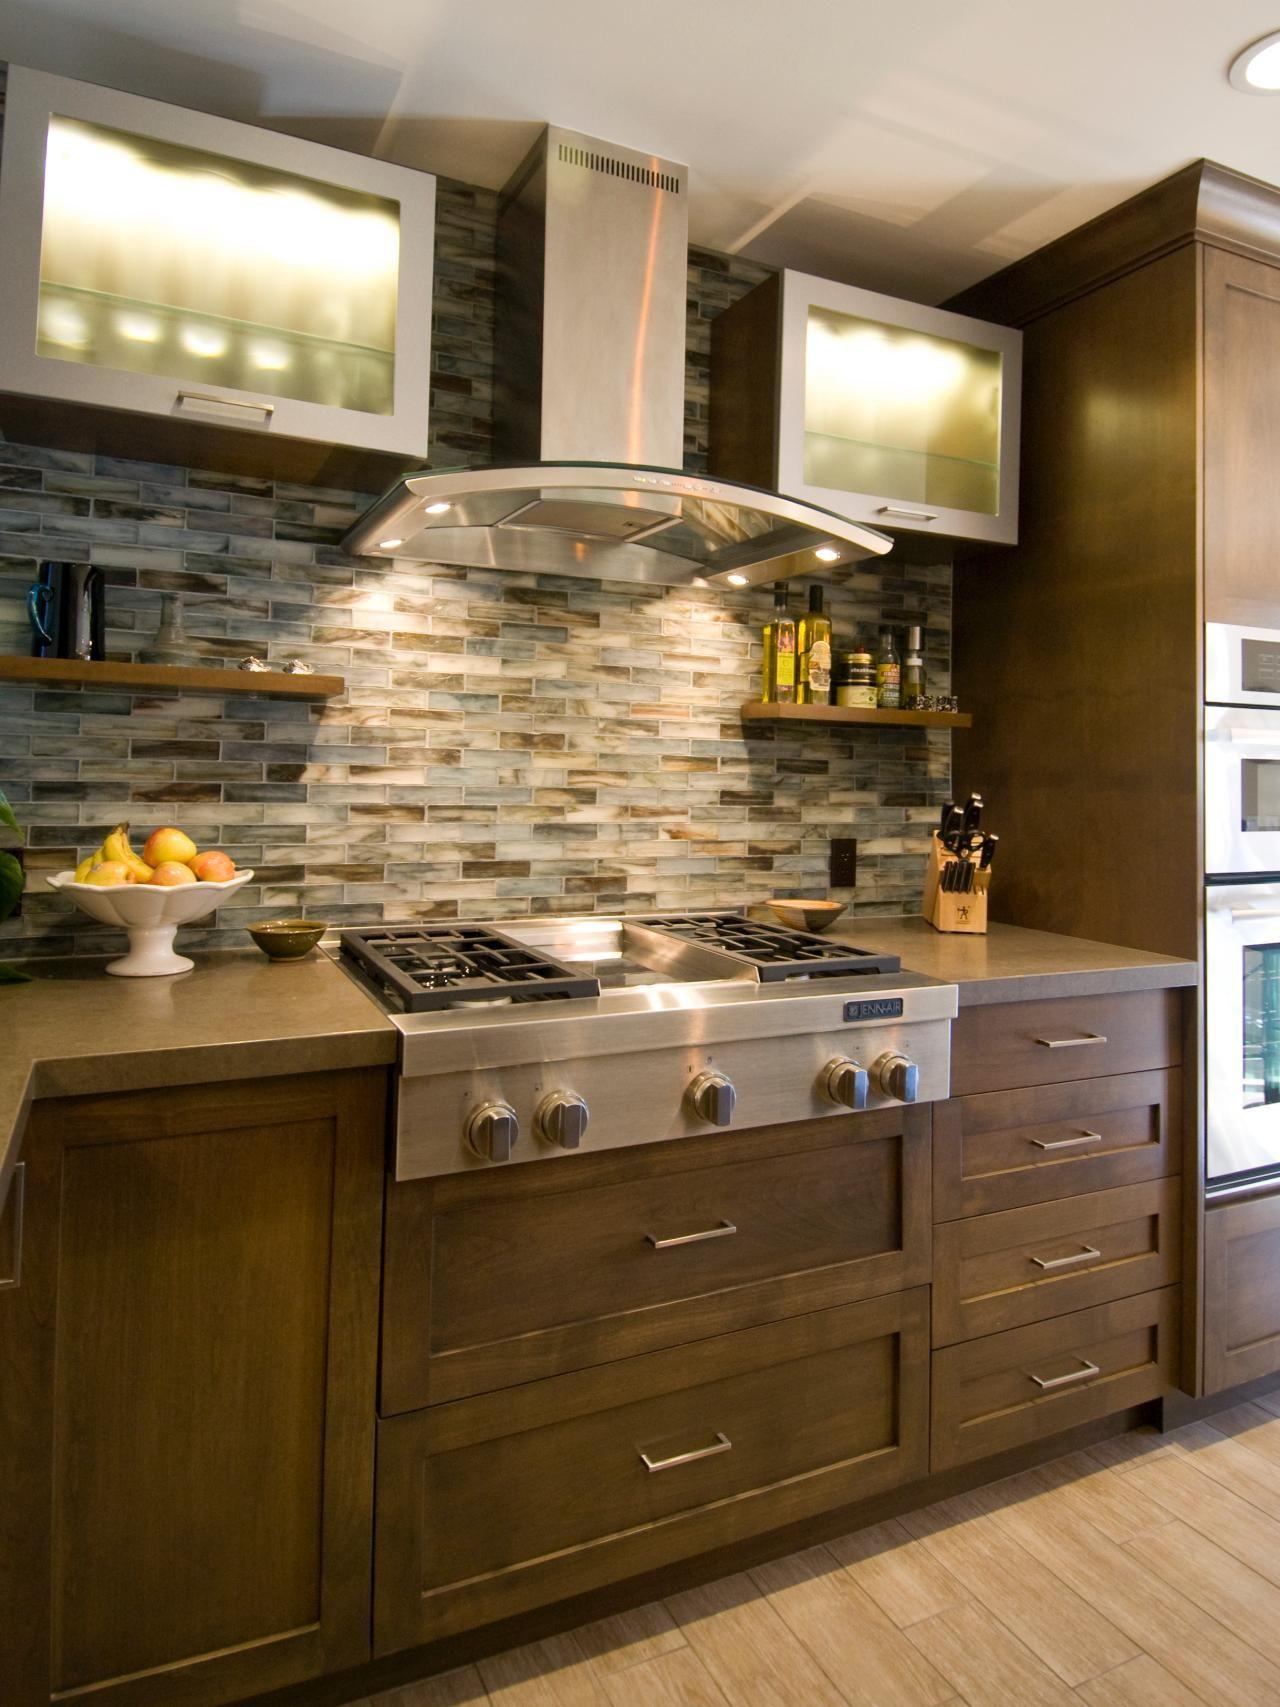 This bold mosaic tile backsplash, open shelving and new